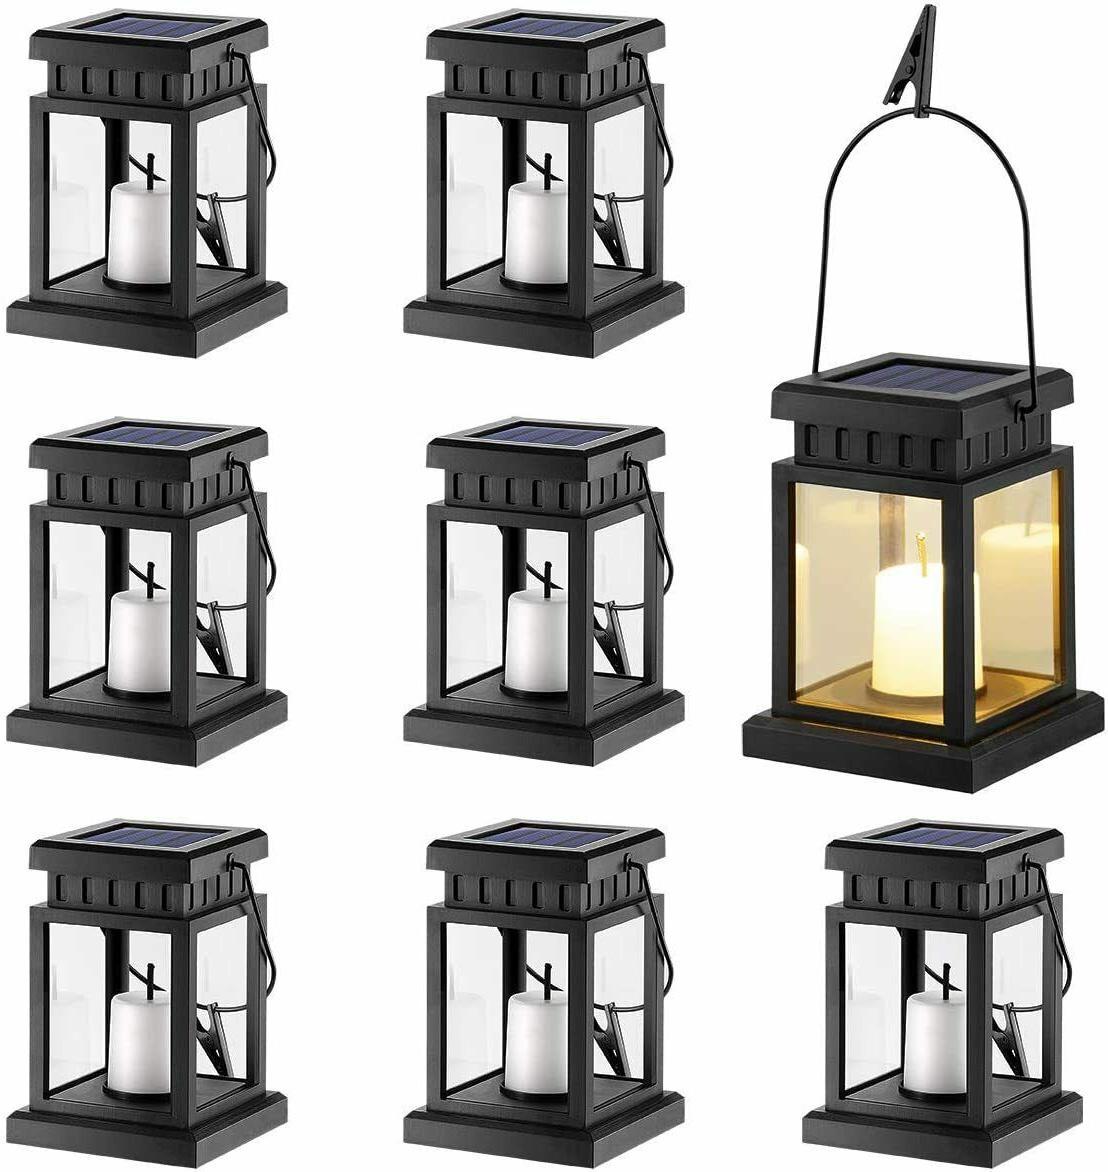 8 Pack Solar Hanging Lantern Outdoor Candle Effect Light War